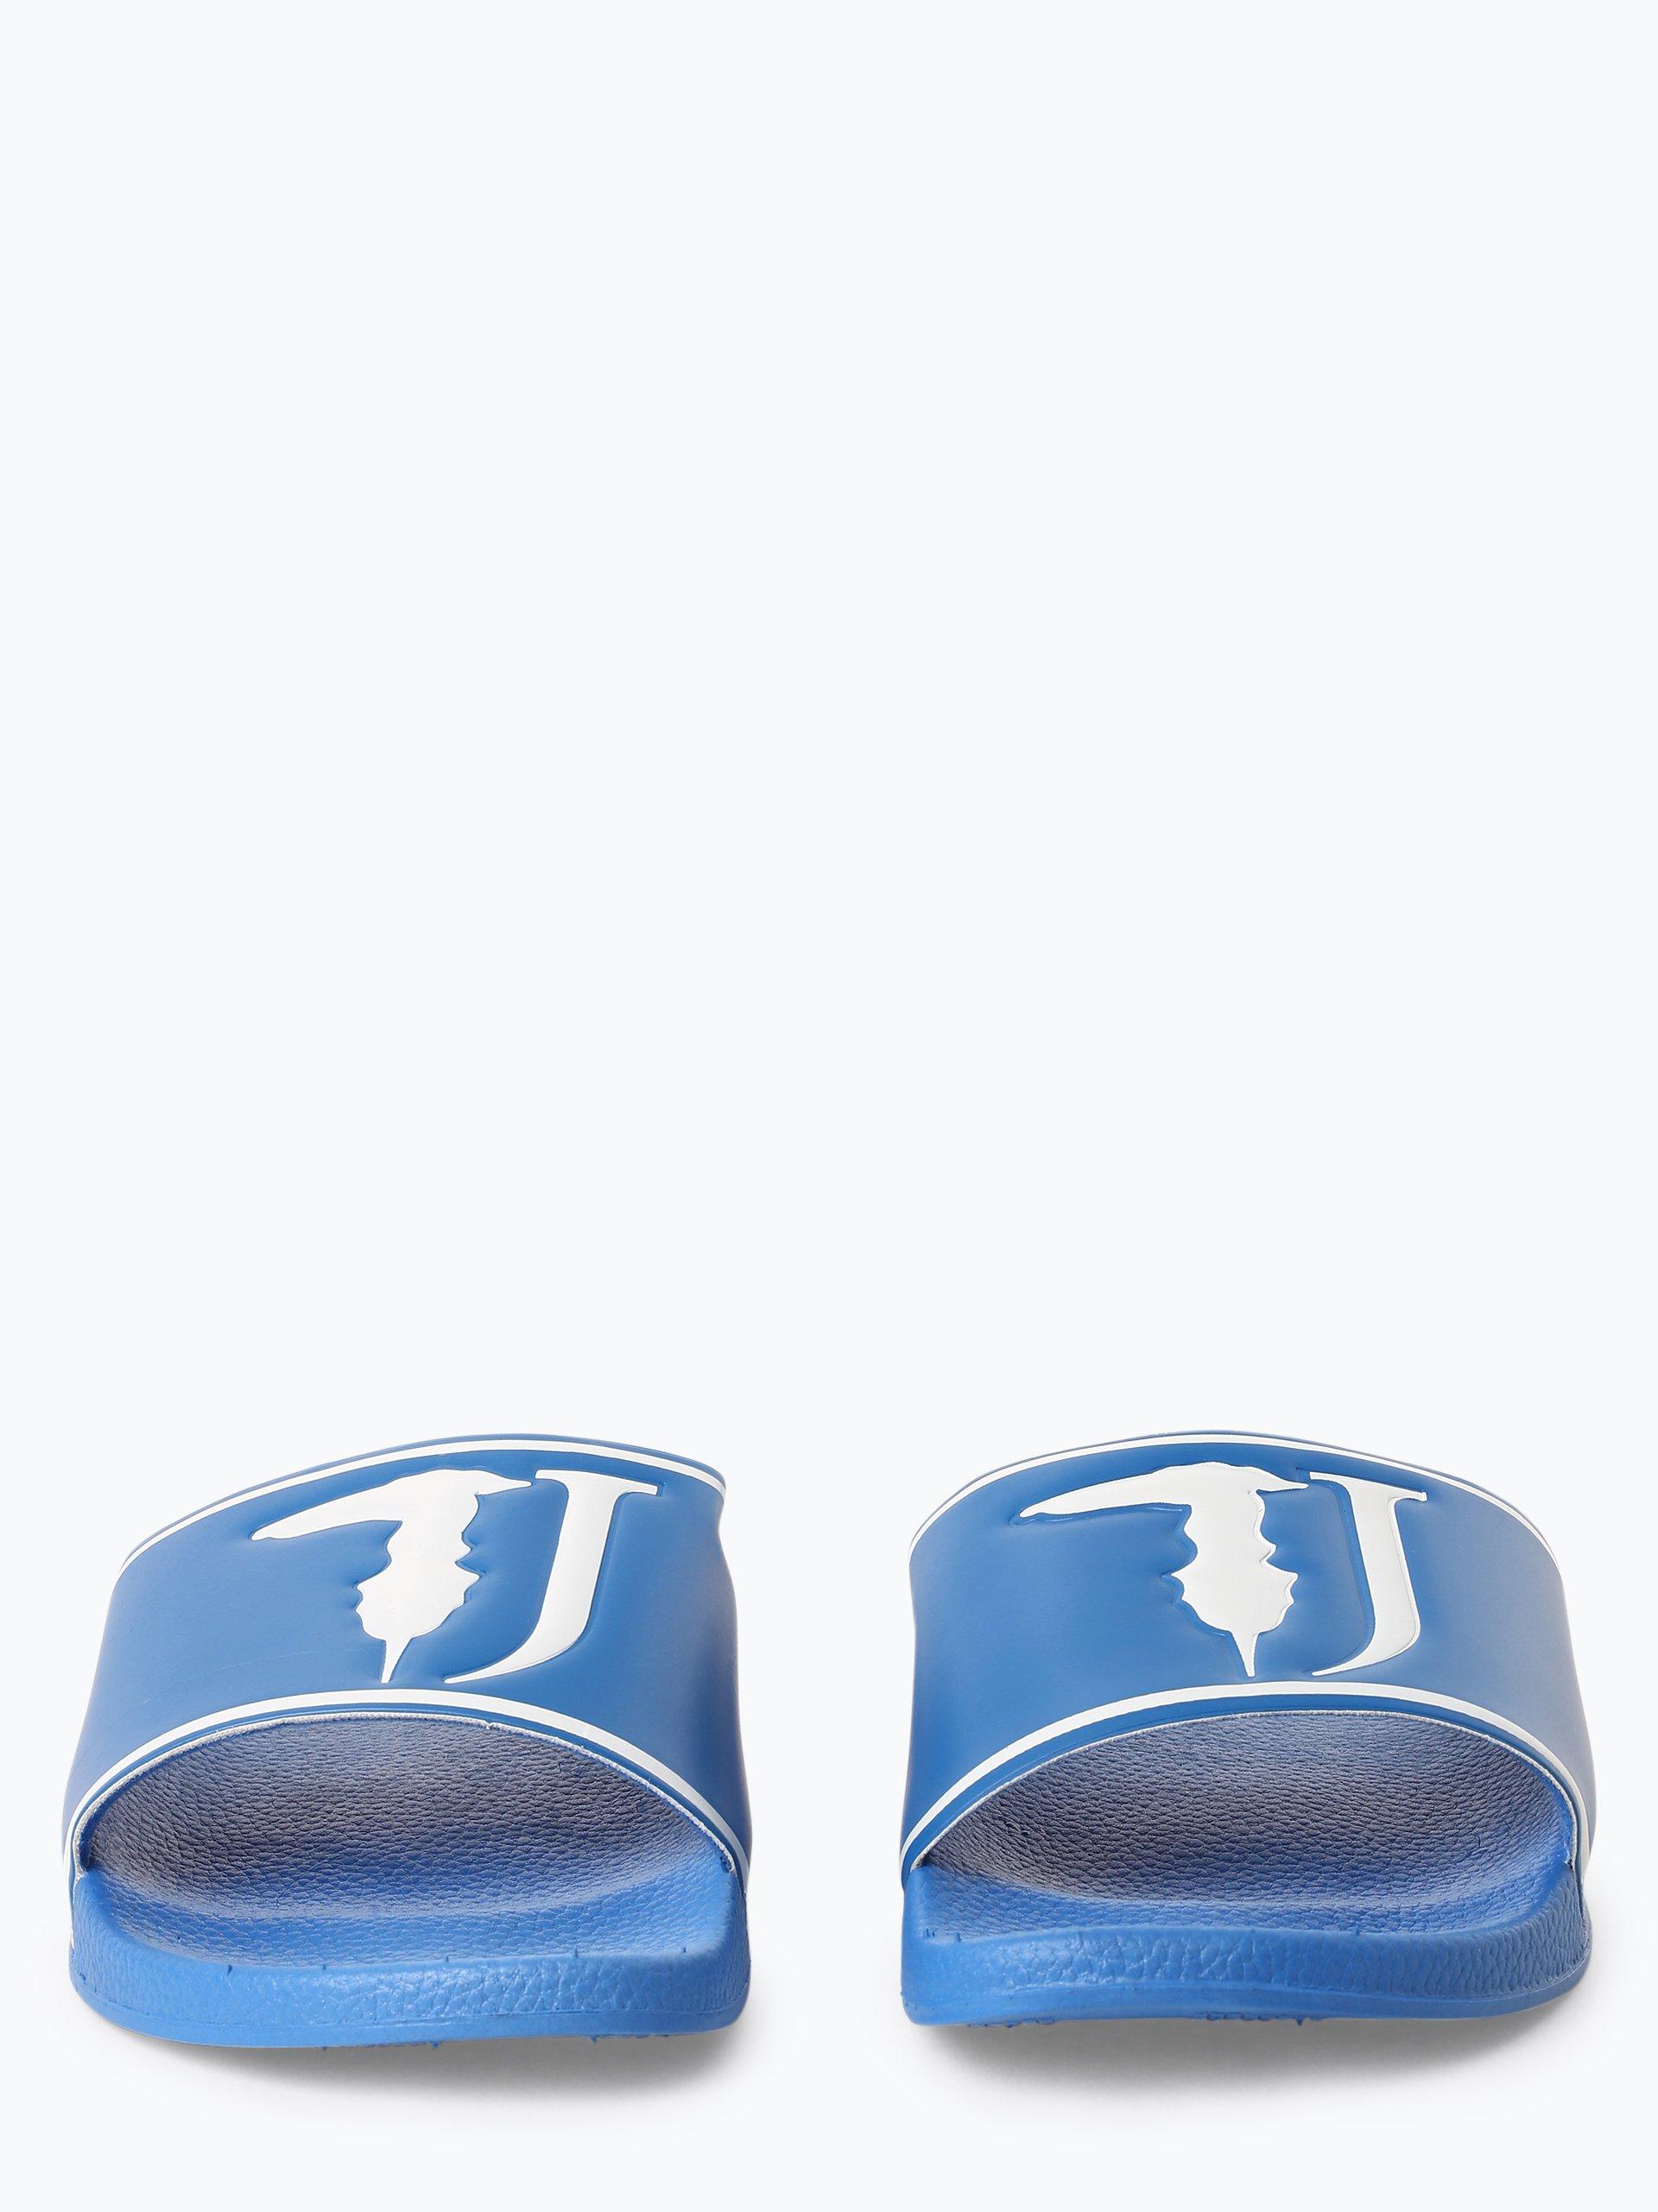 Trussadi Jeans Męskie pantofle kąpielowe